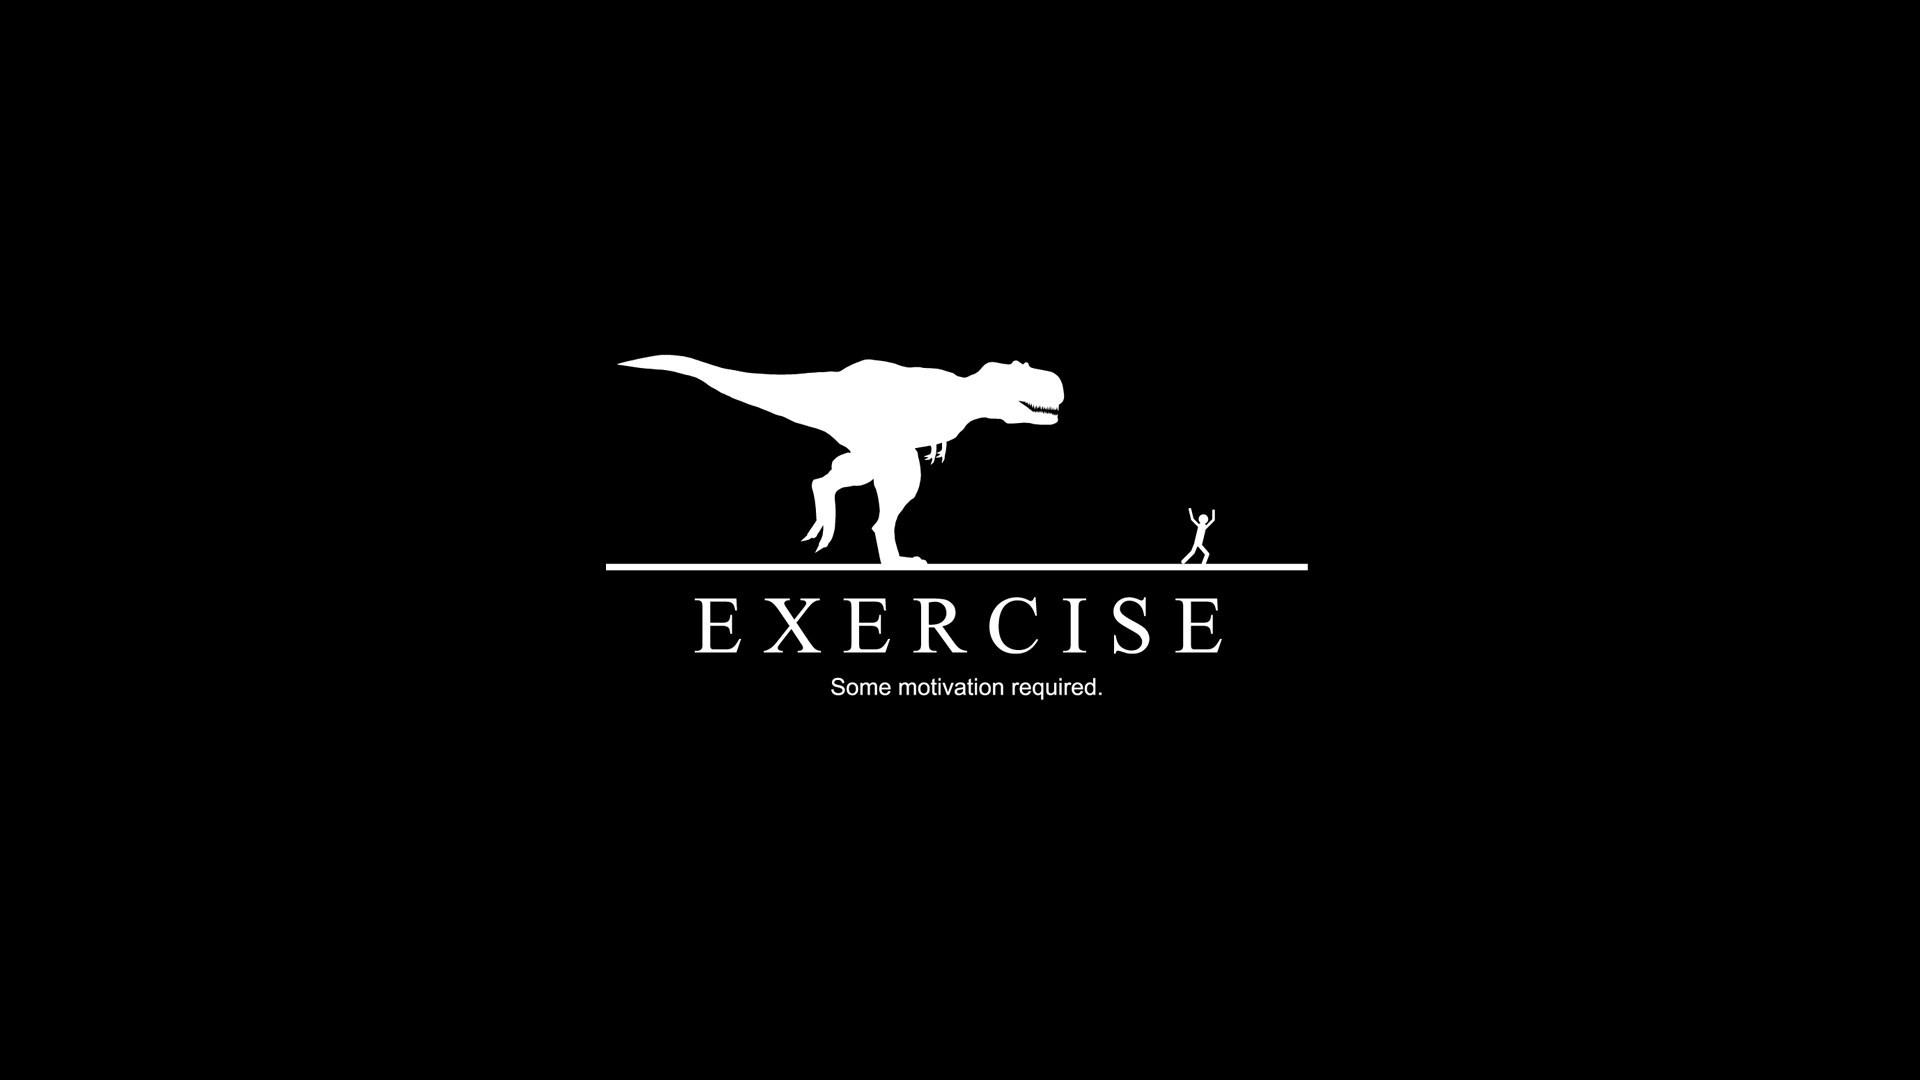 Exercise Dinosaur Man Funny